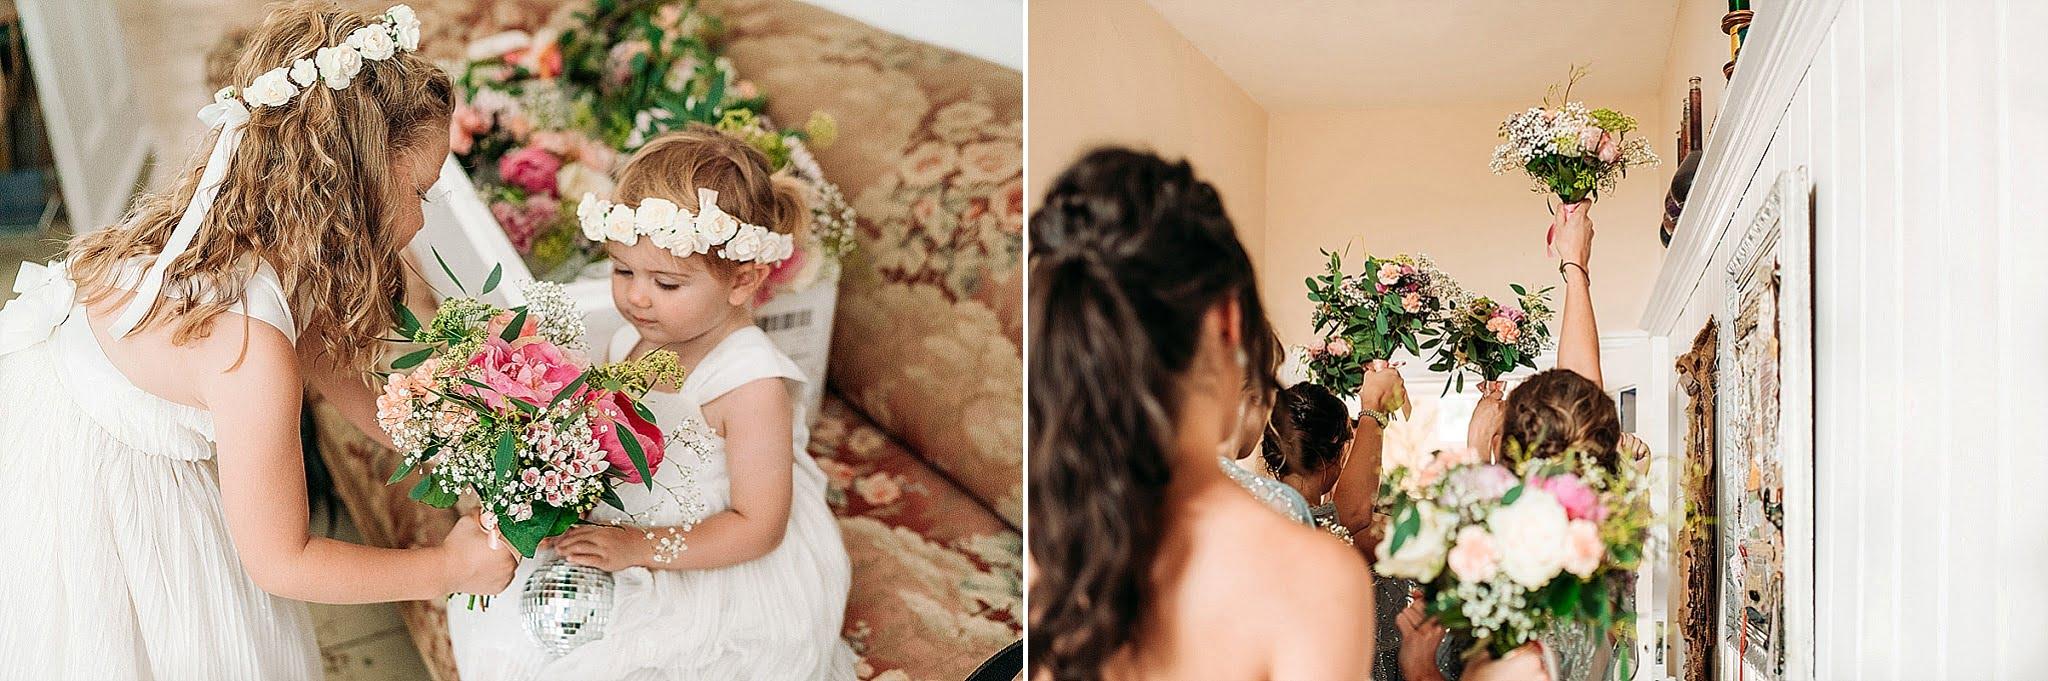 Lyde Court Wedding - Becky + Rhys 22